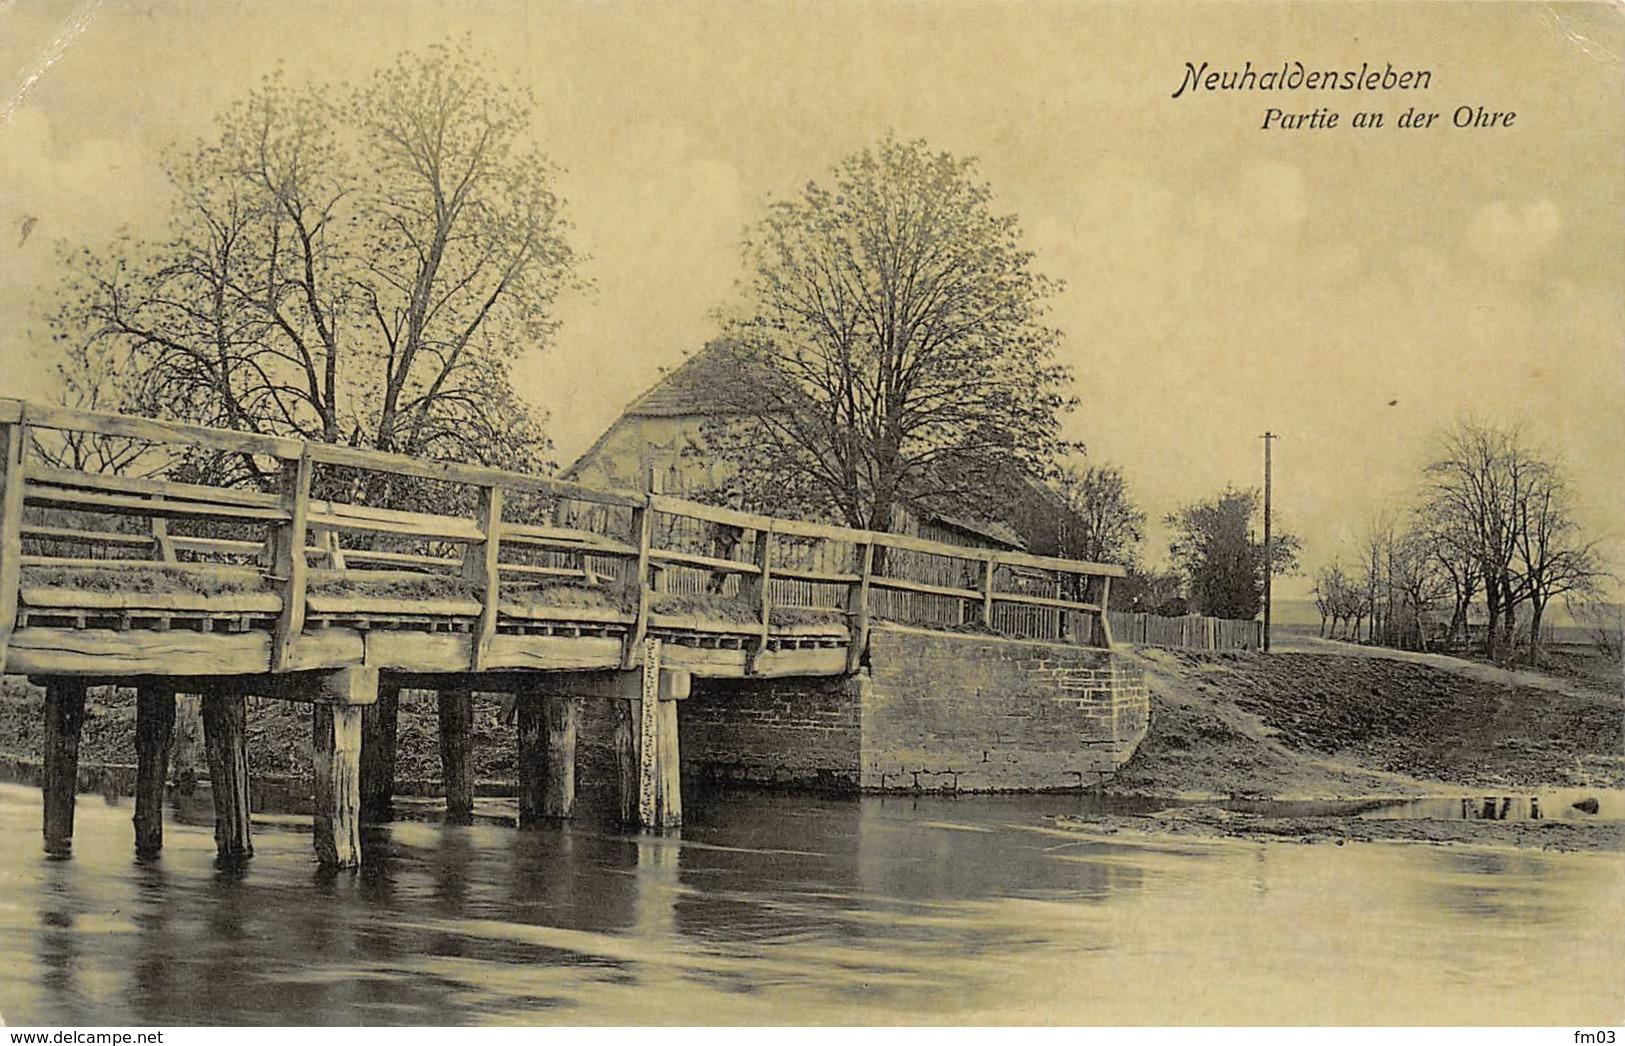 Neuhaldensleben - Germania